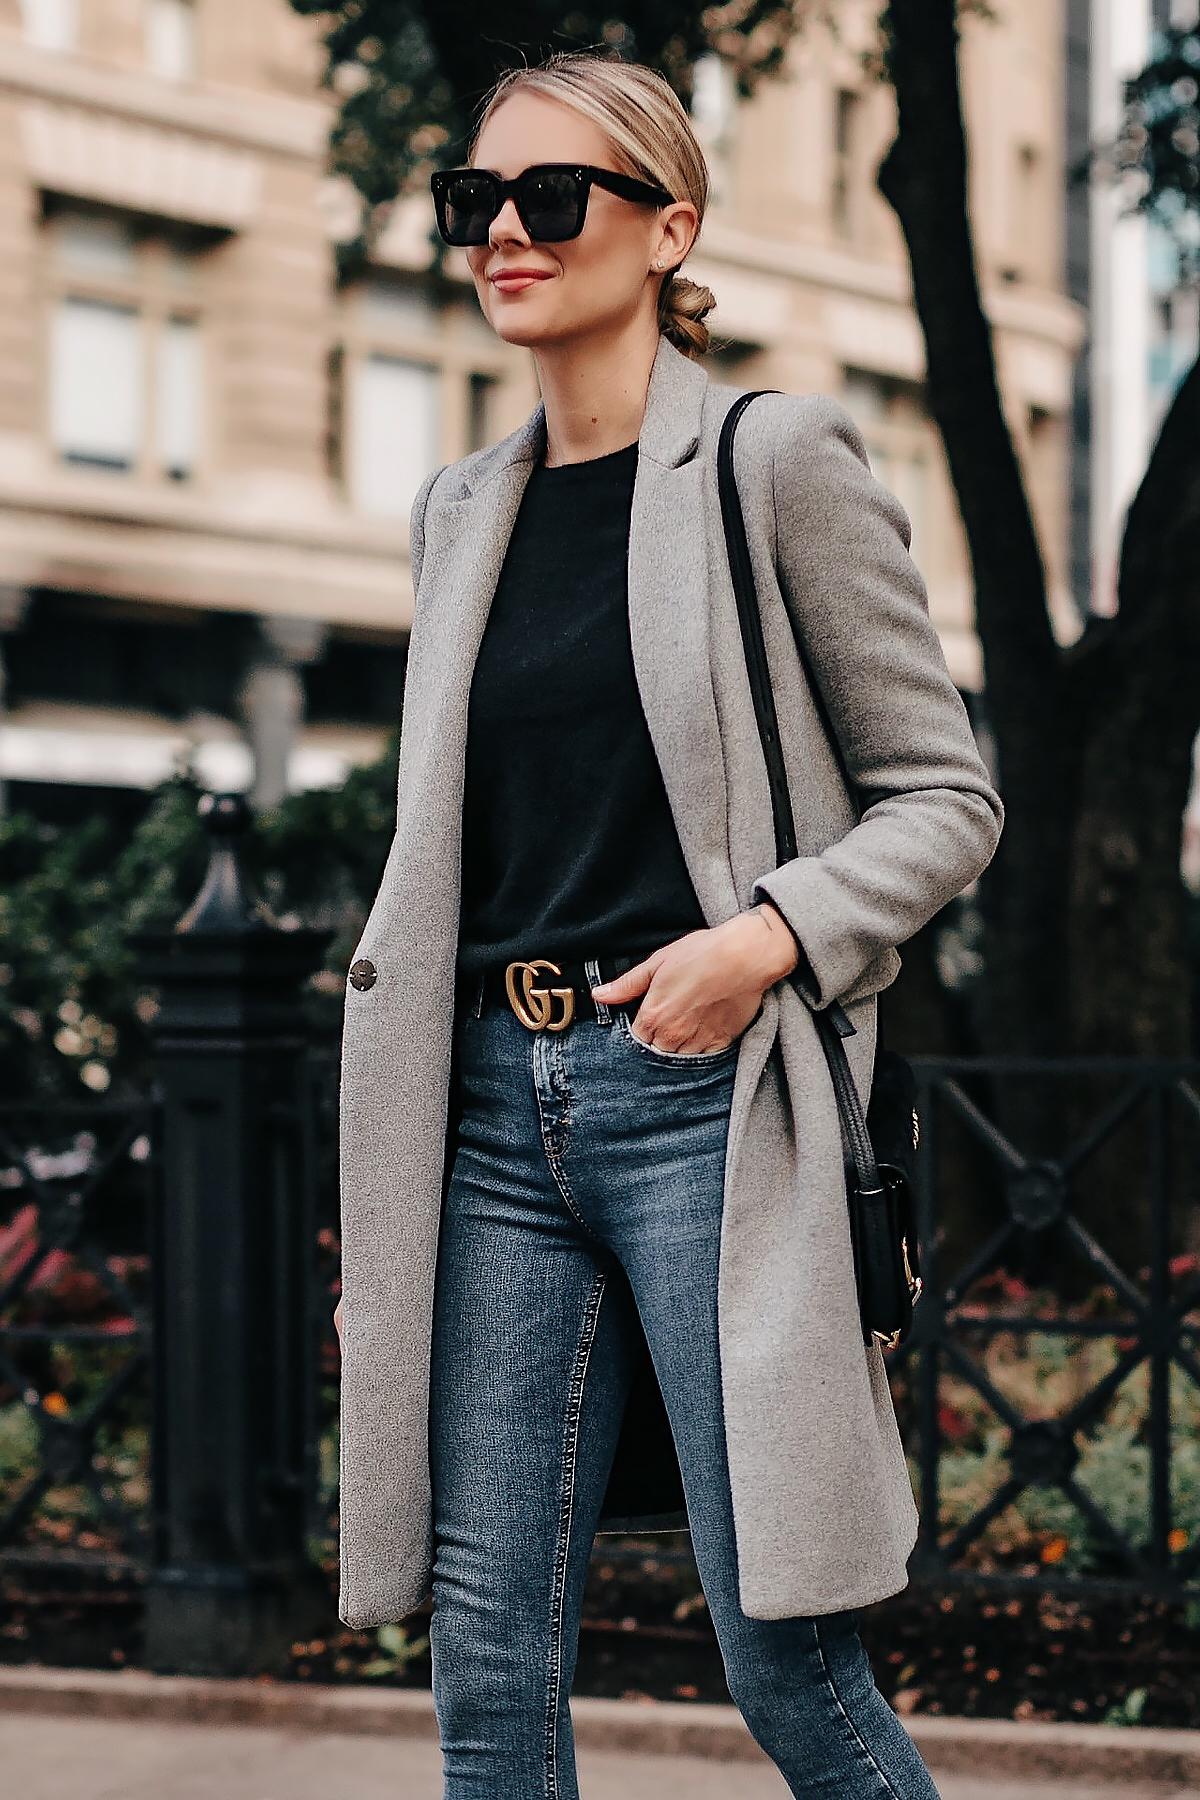 Blonde Woman Wearing Zara Grey Wool Coat Black Sweater Denim Skinny Jeans Gucci Belt Fashion Jackson San Diego Fashion Blogger Street Style